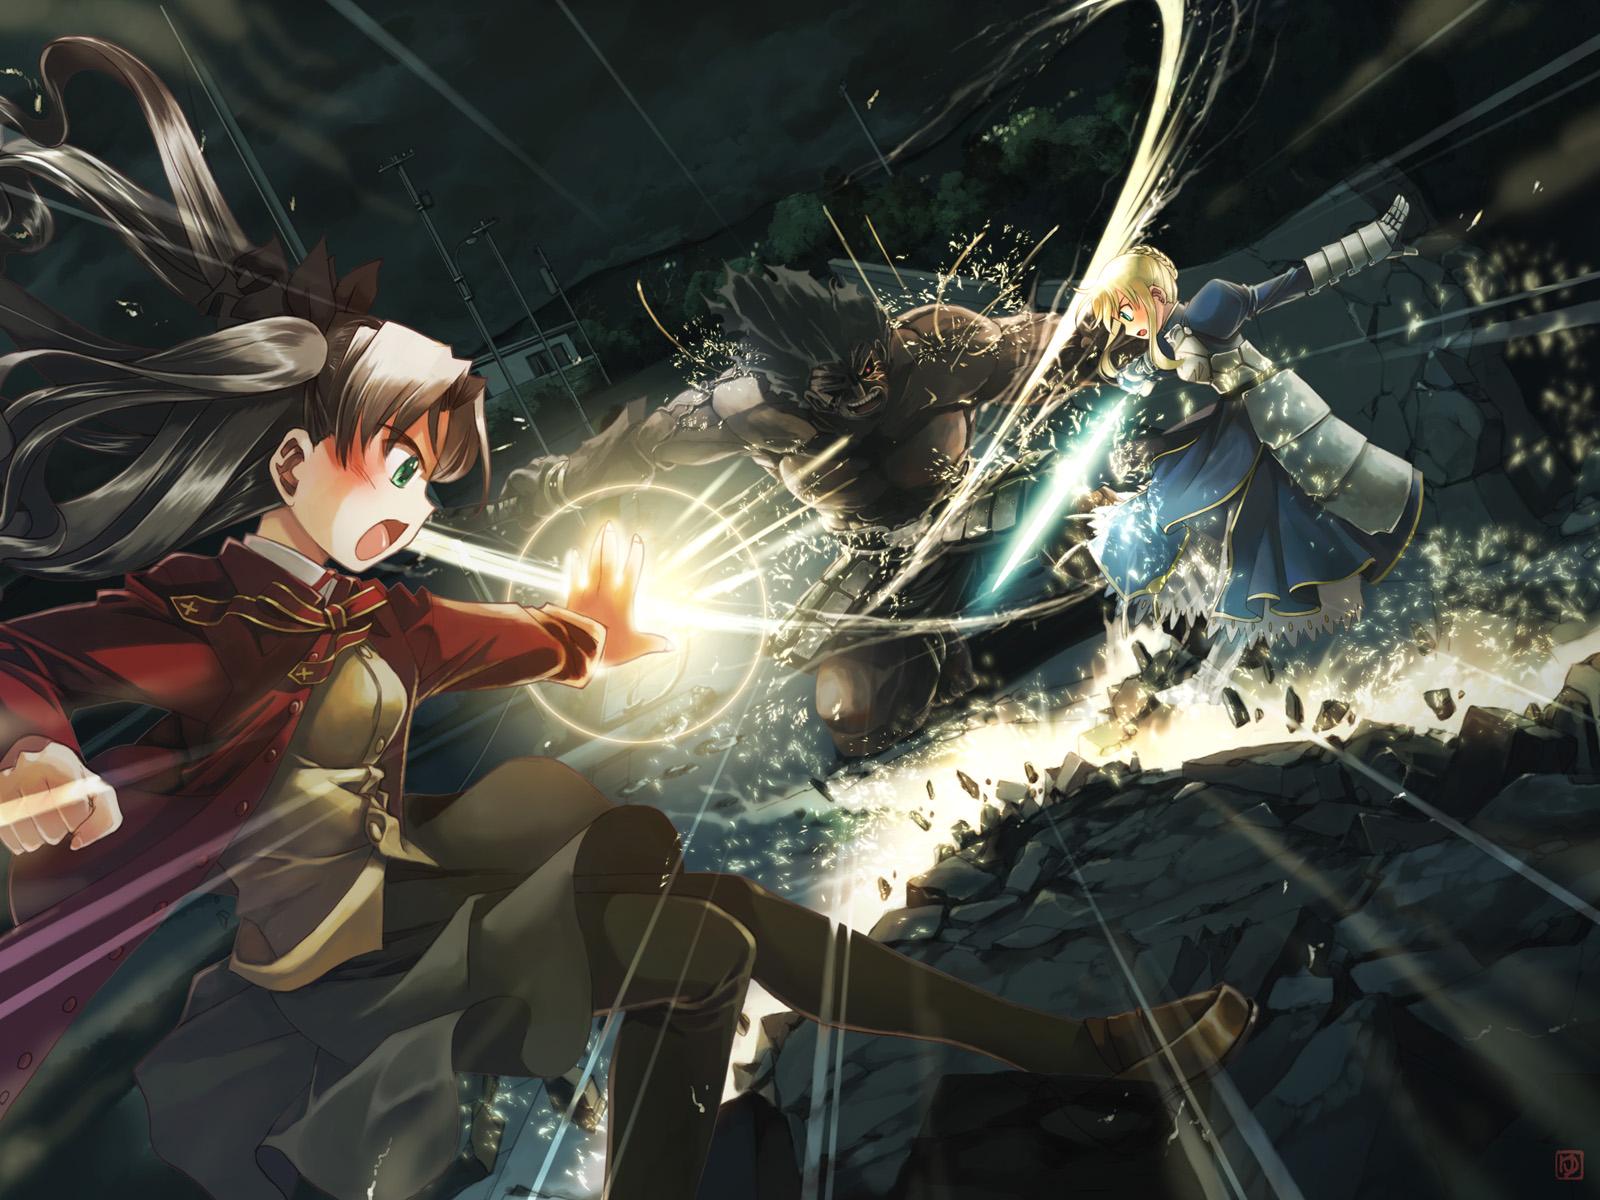 Fate StayNight Black Armor Sword Girl Anime Fighting HD Wallpaper 1600x1200